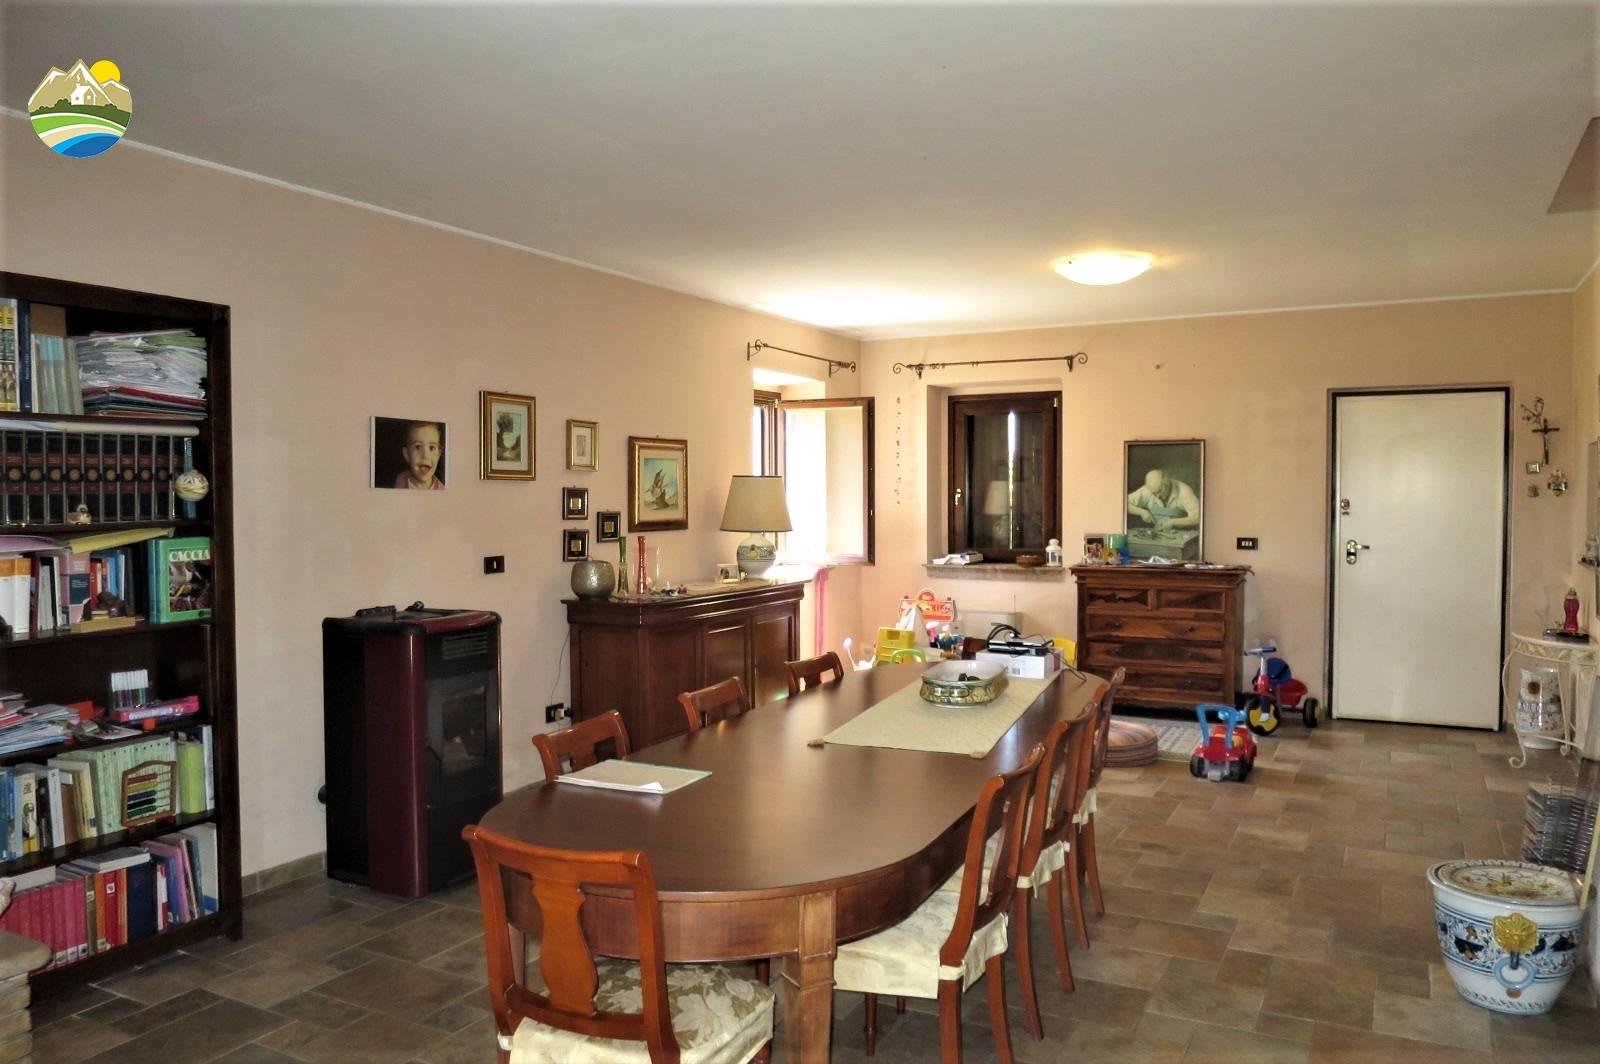 Country Houses Country Houses for sale Morro D'Oro (TE), Casa del Moro - Morro D'Oro - EUR 327.141 490